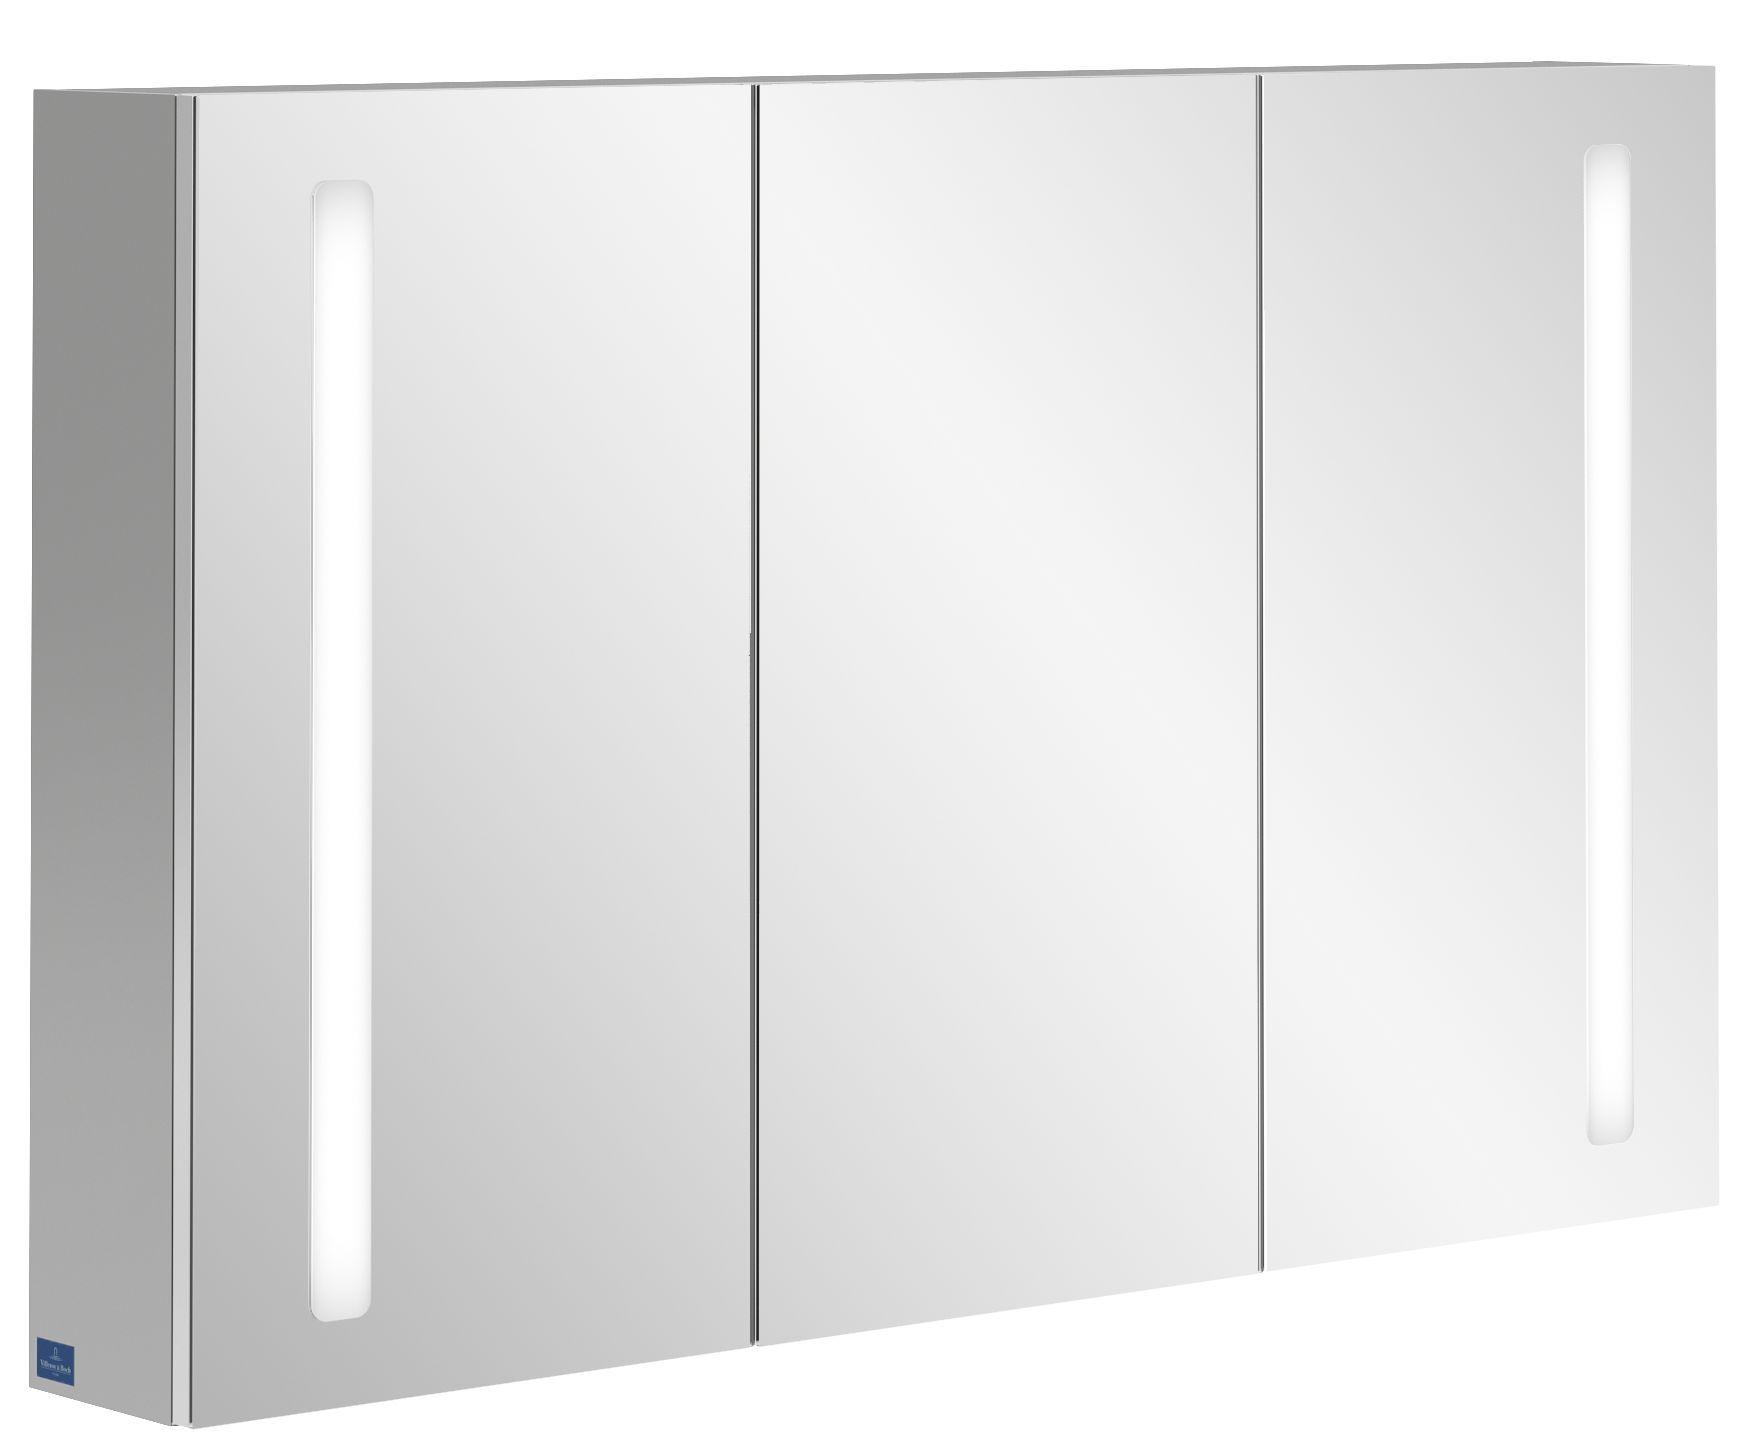 Villeroy & Boch My View 14 Spiegelschrank mit LED-Beleuchtung B:120 cm A4231200